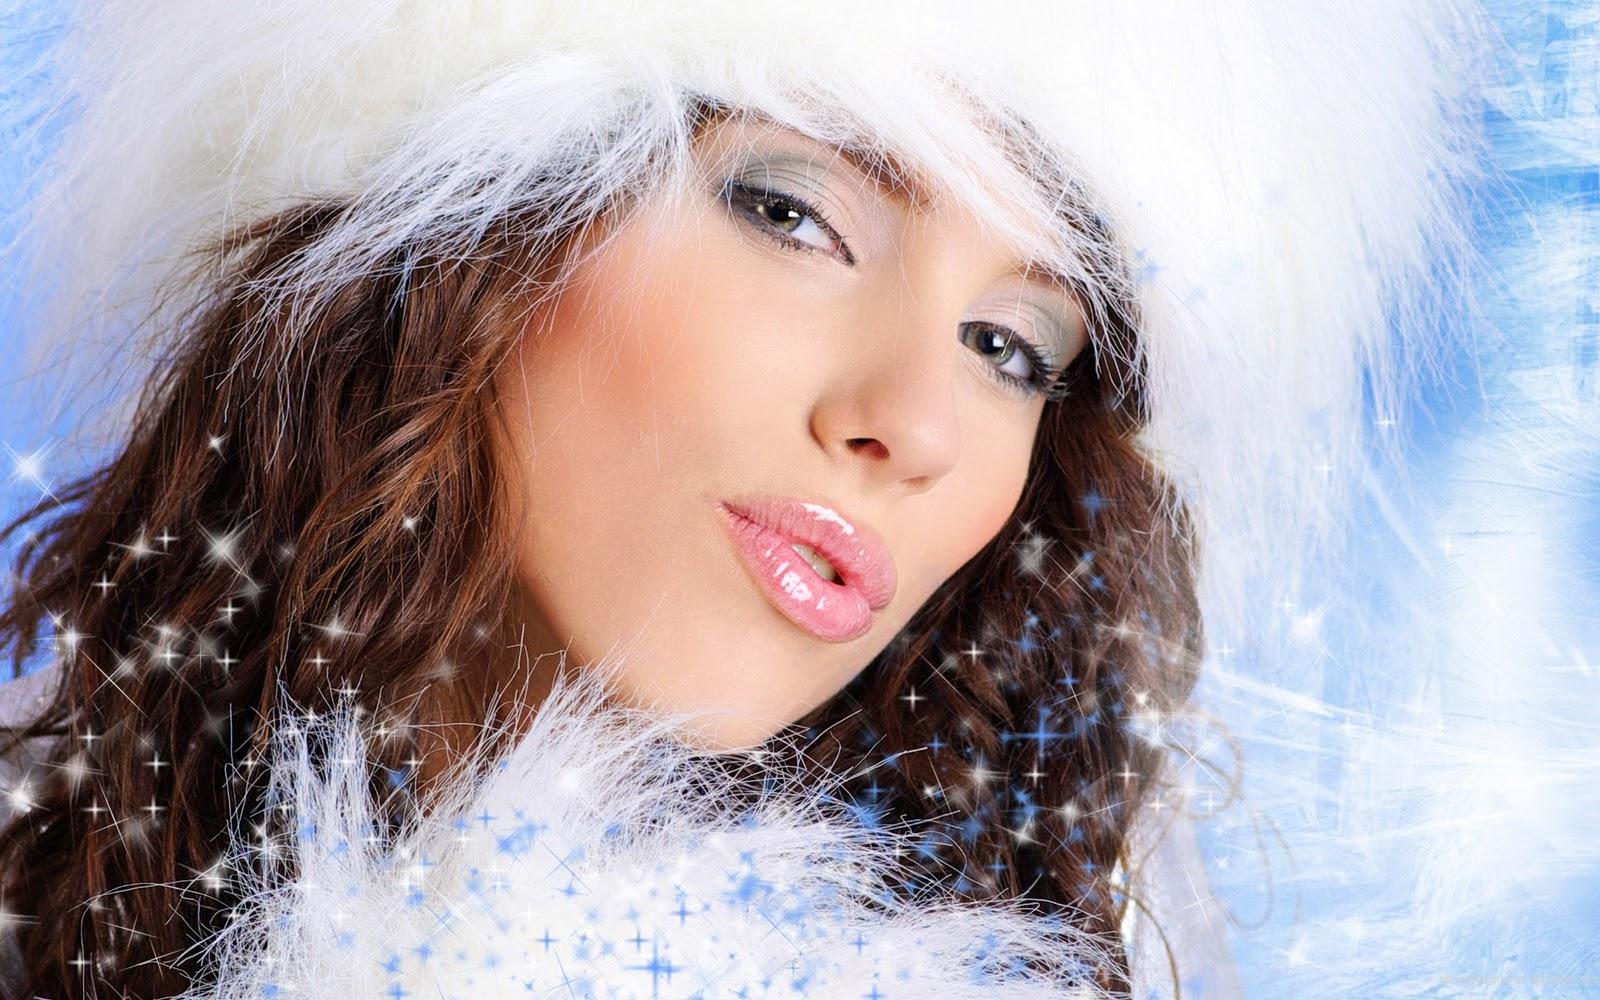 http://4.bp.blogspot.com/_brrsmWt5td0/TQpFm2REx8I/AAAAAAAAAY0/zyaNIMIEXz4/s1600/sexy-christmas-girls-hd-wallpaper-1-5.jpg